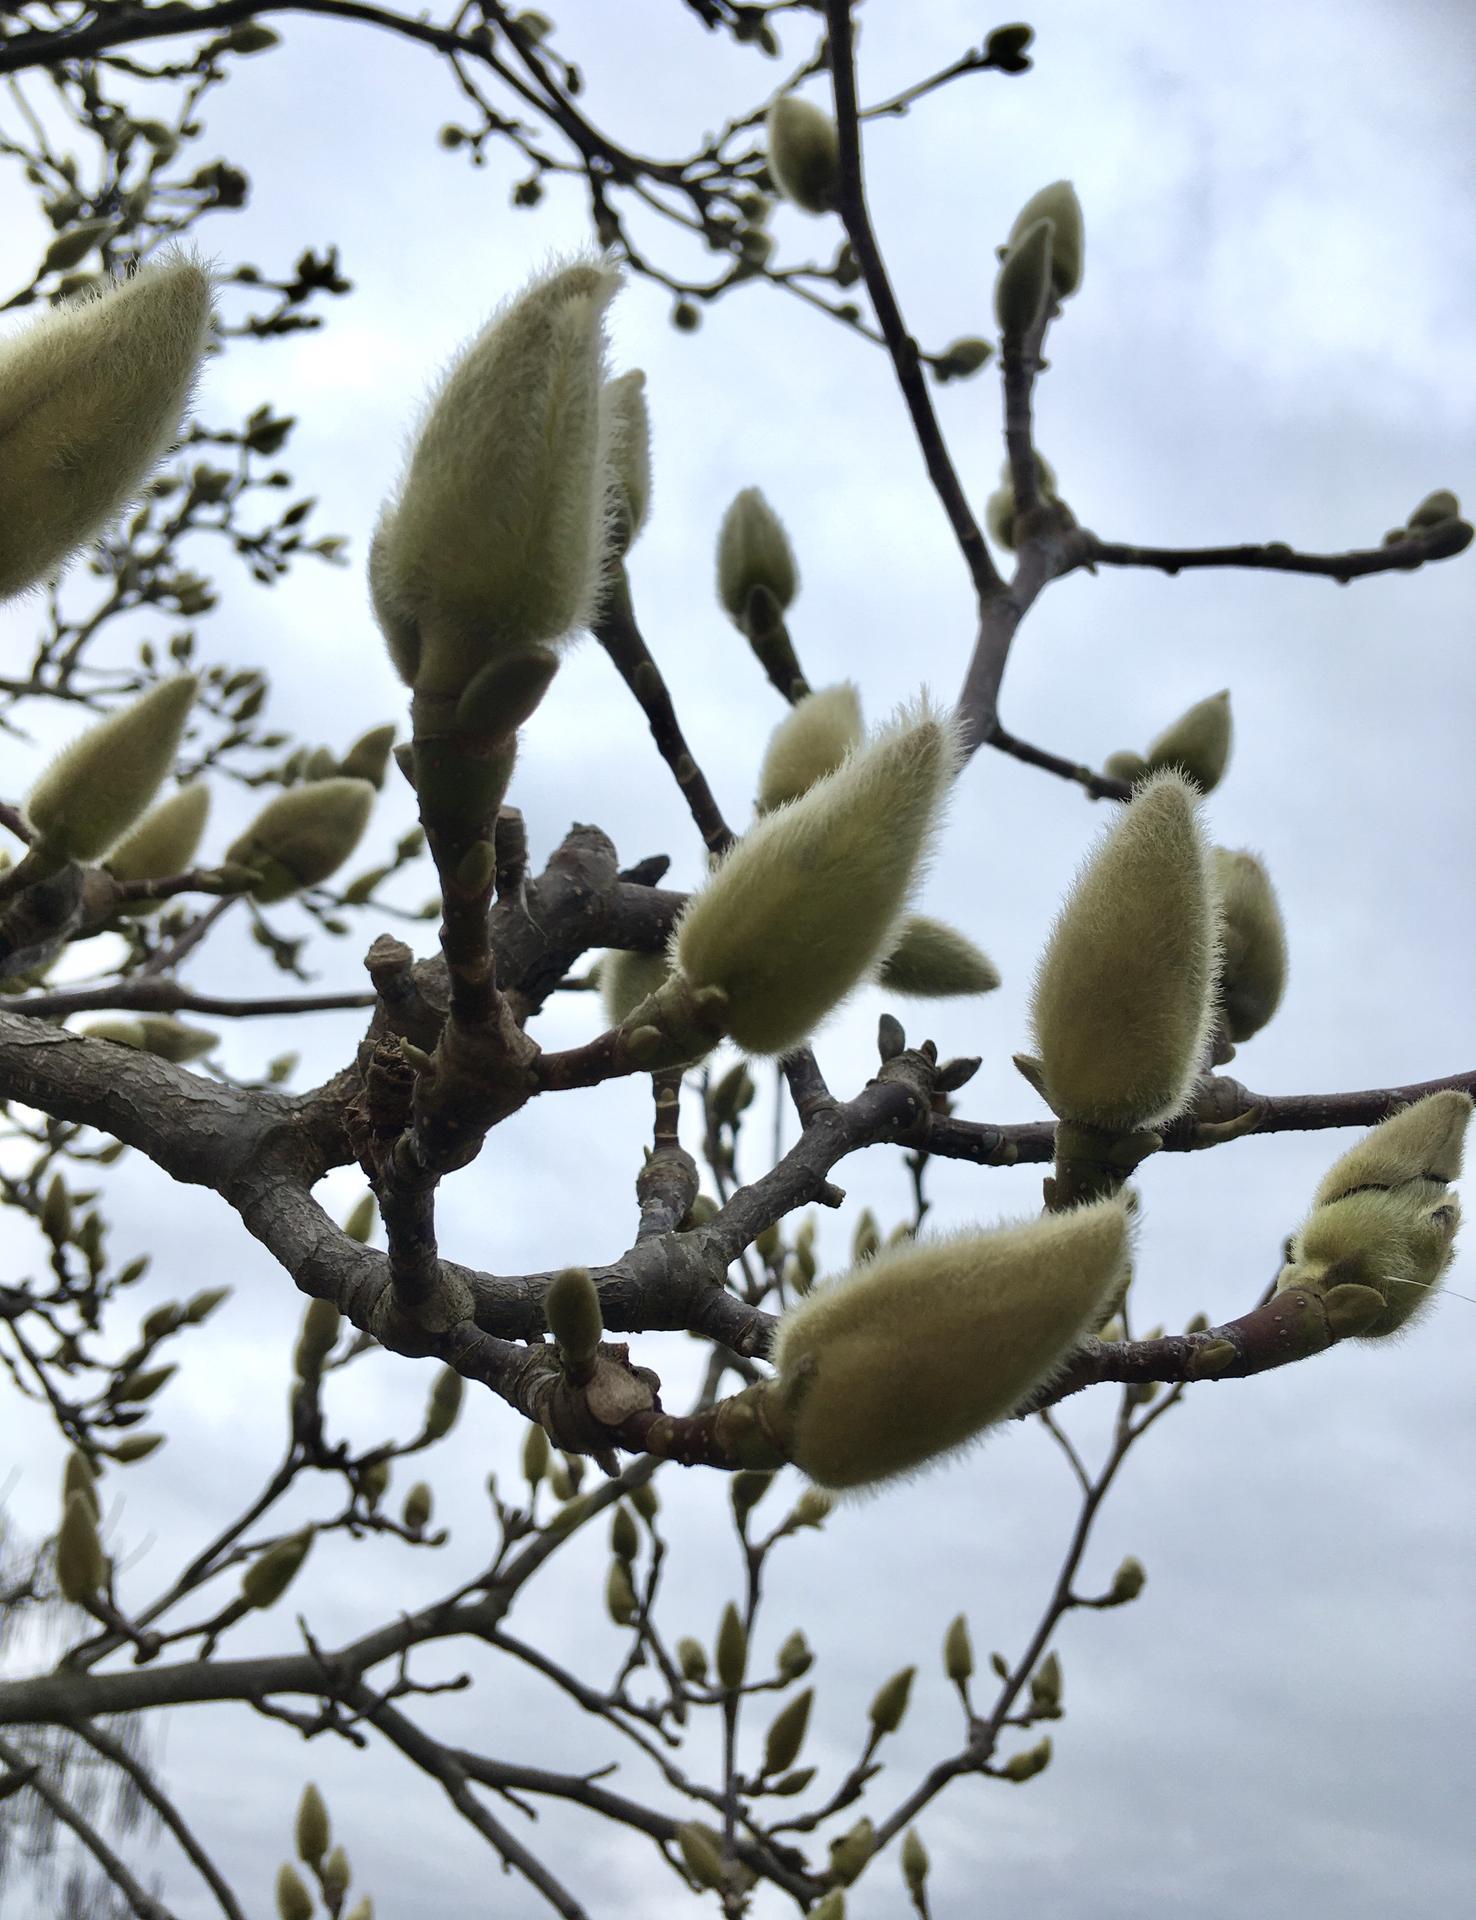 Zahrada 2020 - Magnolie- uz to vypada nadejne, ze letos poupata nepomrznou jako pred dvema lety pozdnimi mrazy- a zhruba za mesic by se mely zacit klubat prvni ruzove okvetni listky🤗